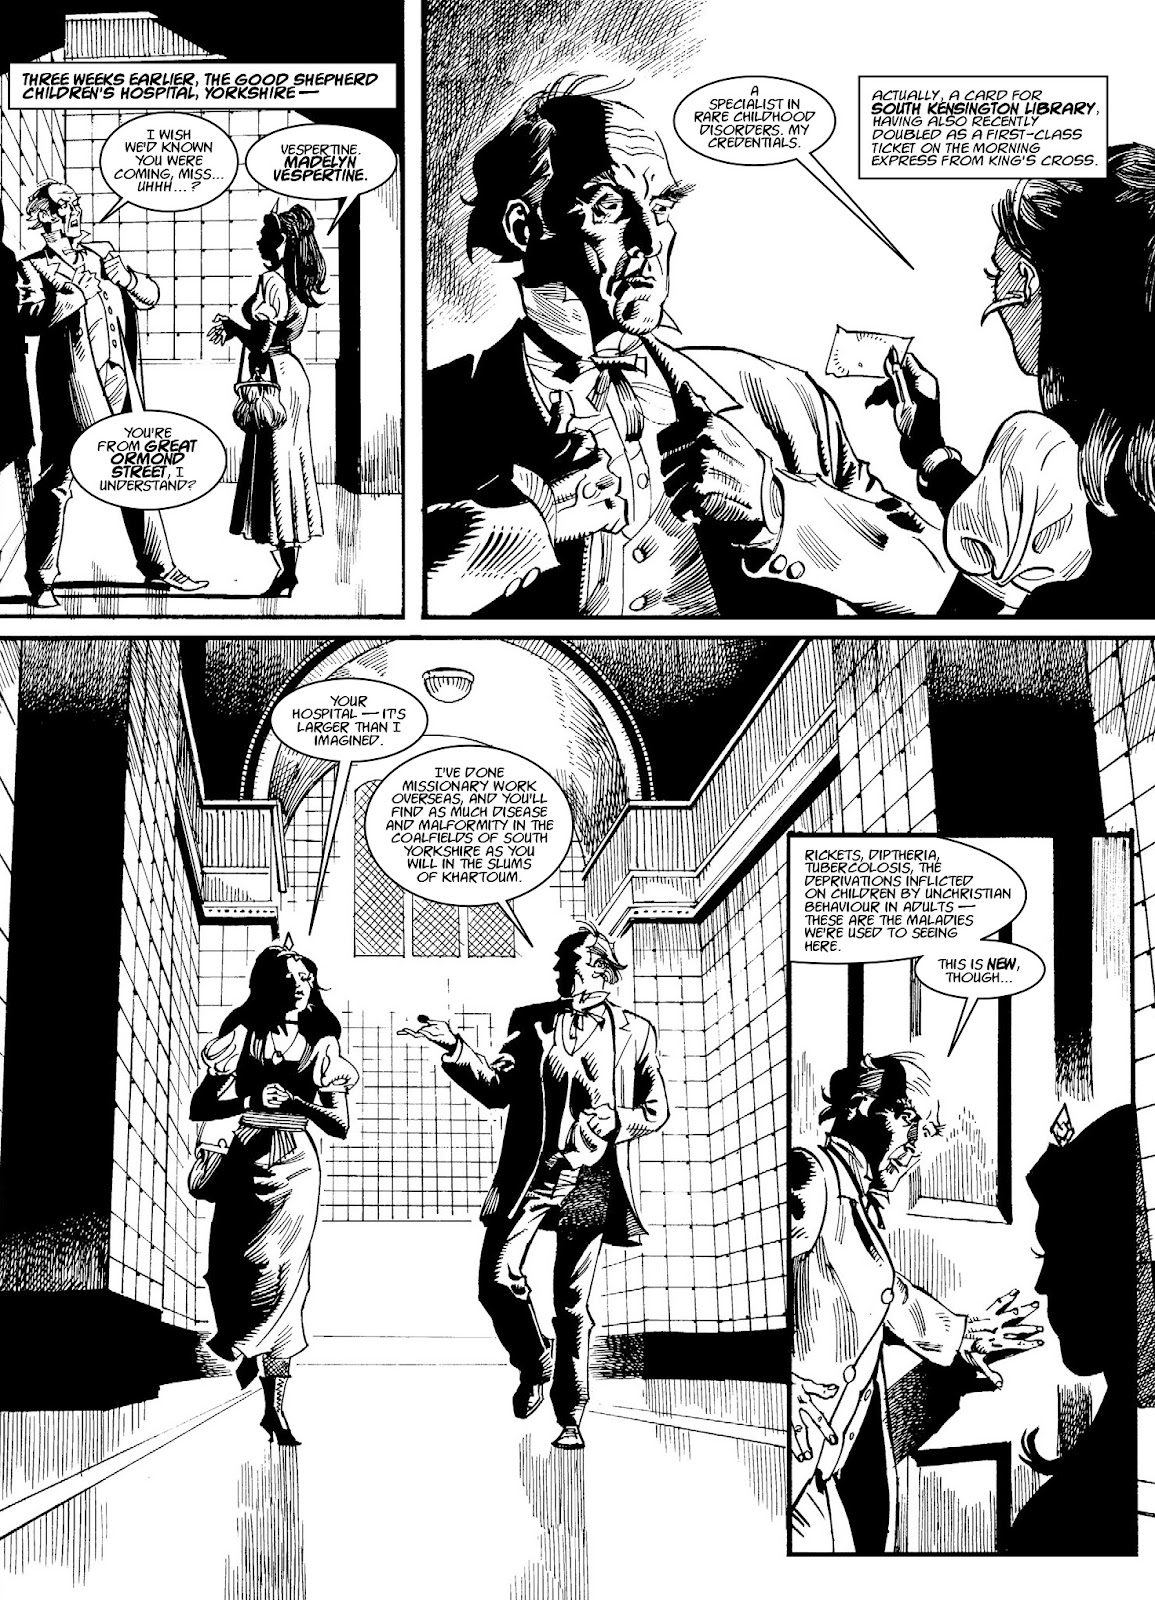 Judge Dredd Megazine (Vol. 5) issue 427 - Page 69